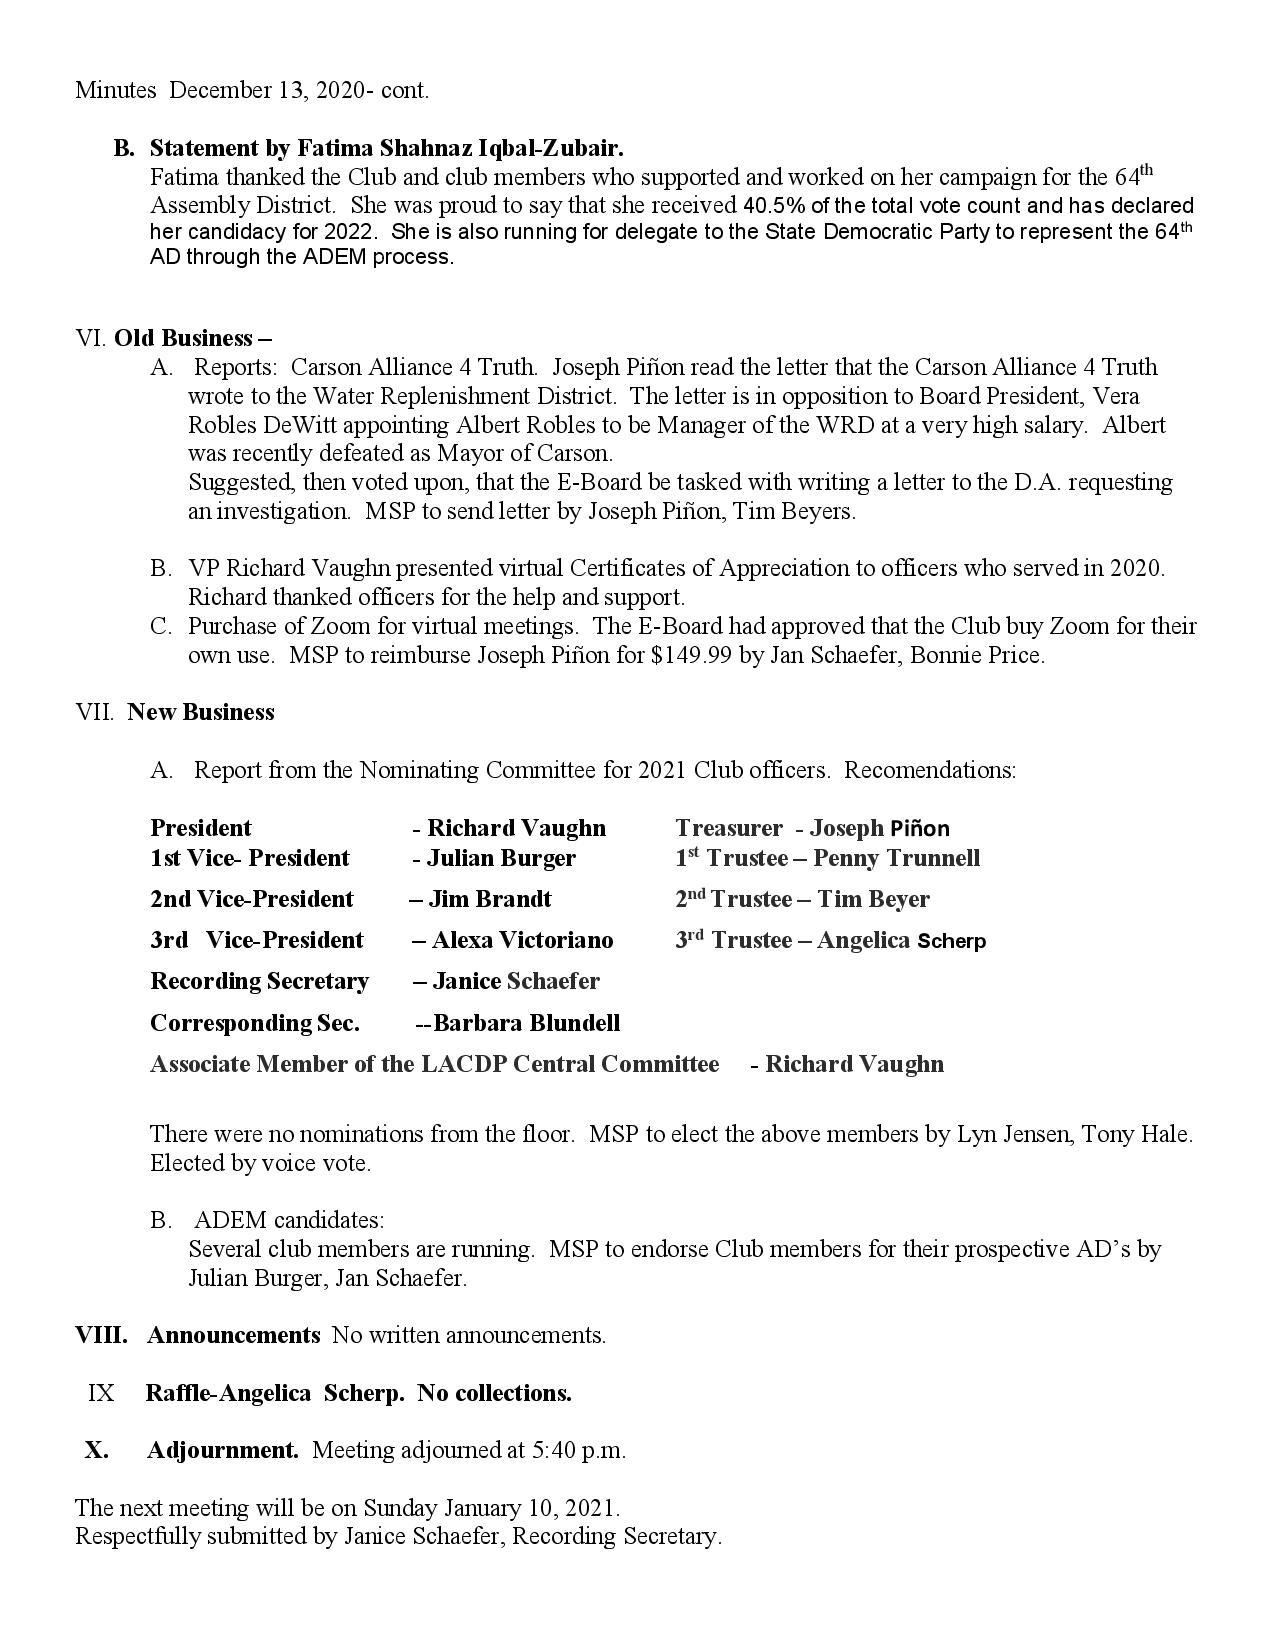 Minutes_December13_2020-page-002.jpg